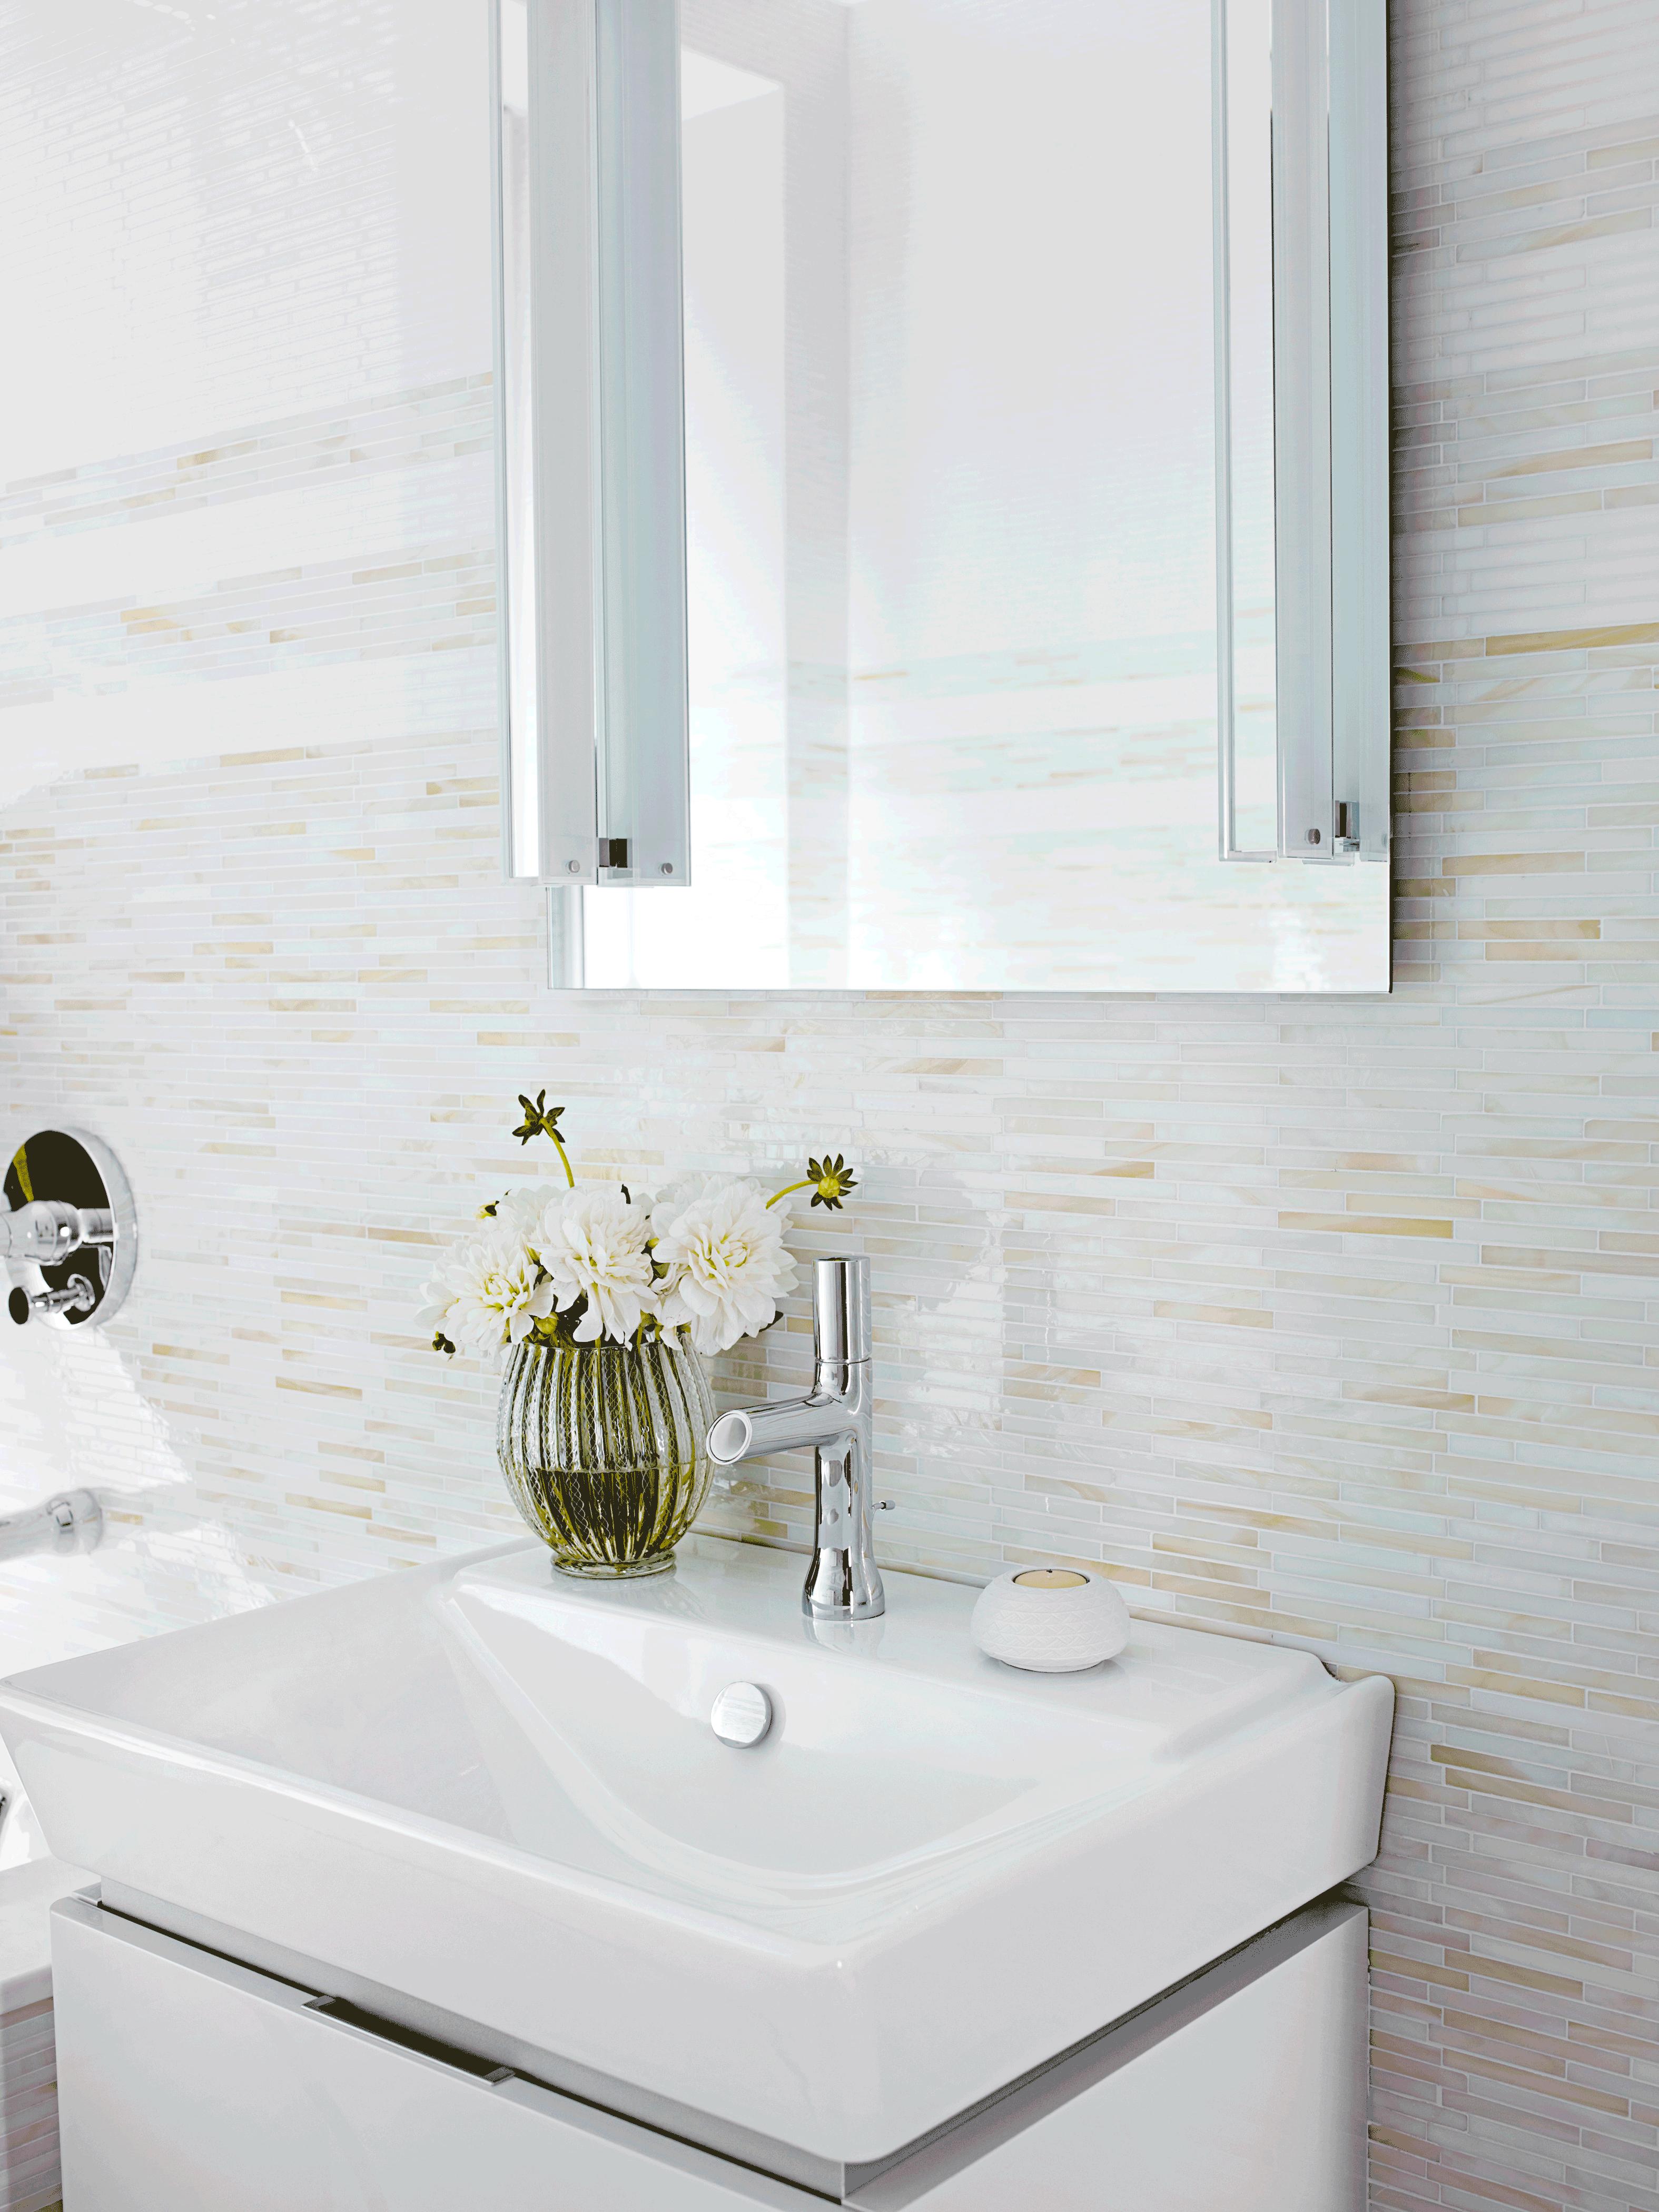 ANN SACKS Lume sticks glass mosaic in cream and white (designer ...